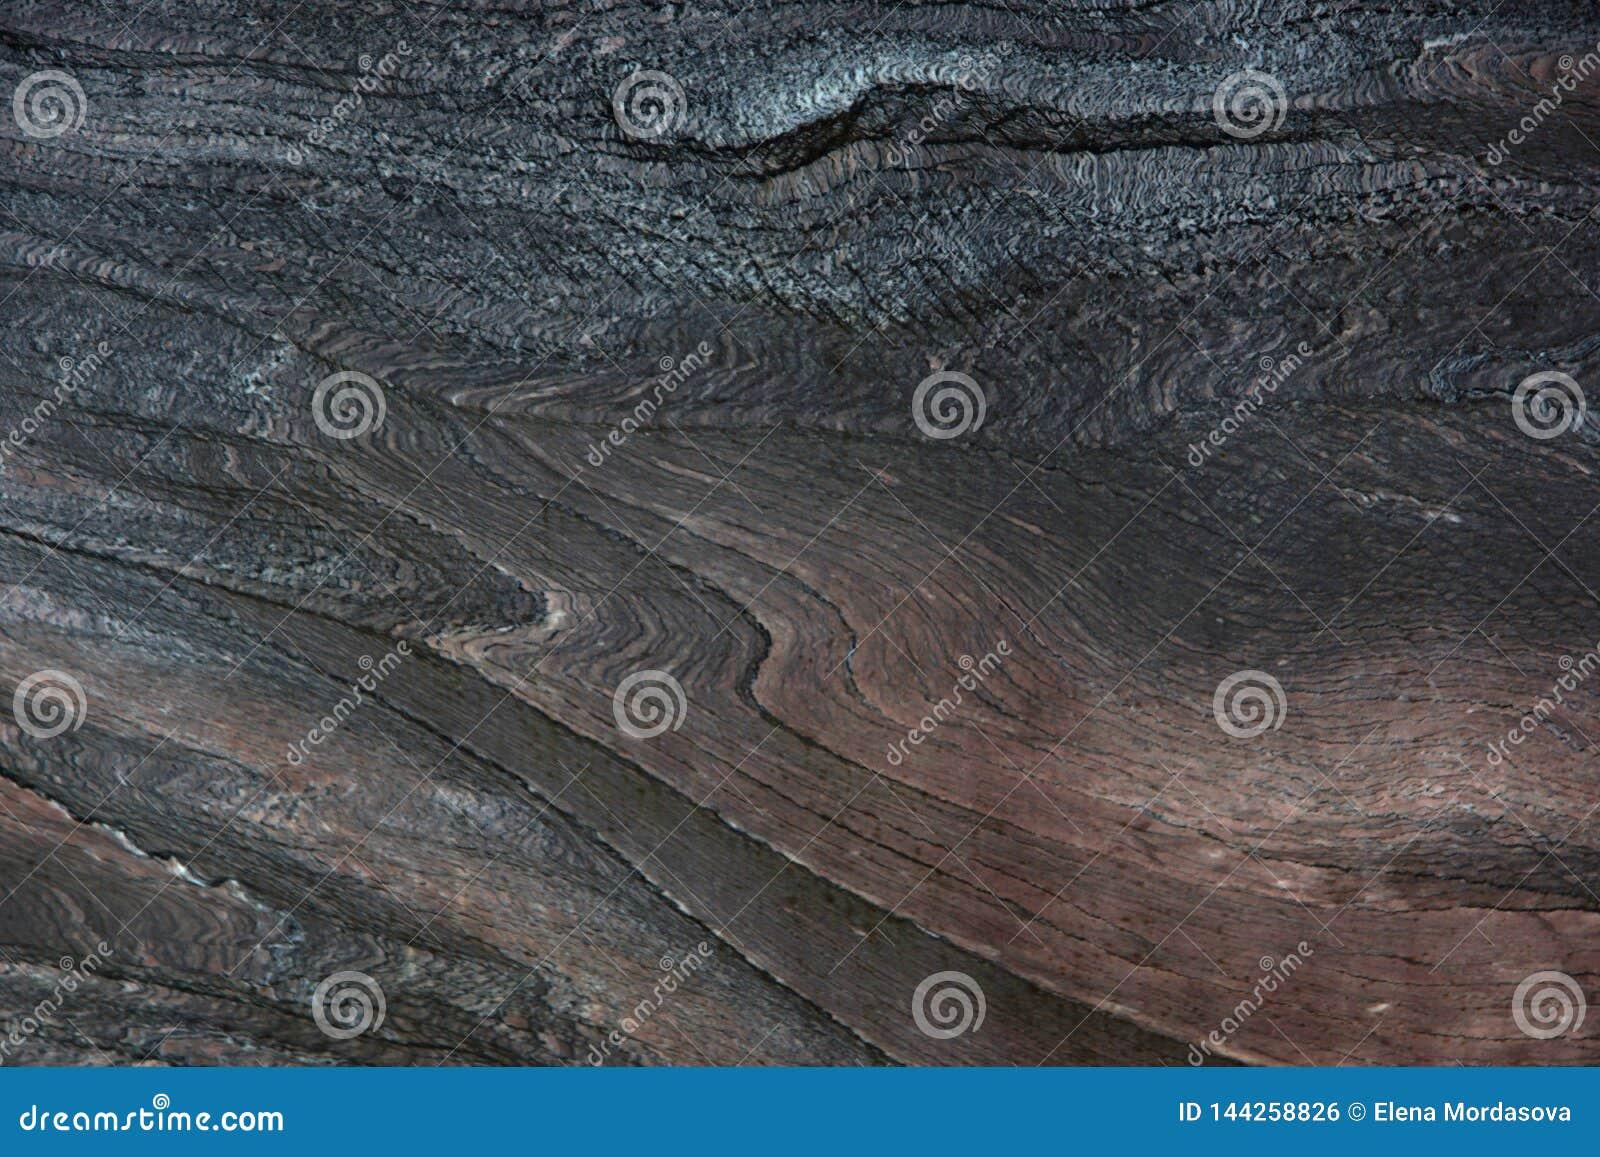 Natural stone dark quartzite with beautiful patterns, called Rosso Luana